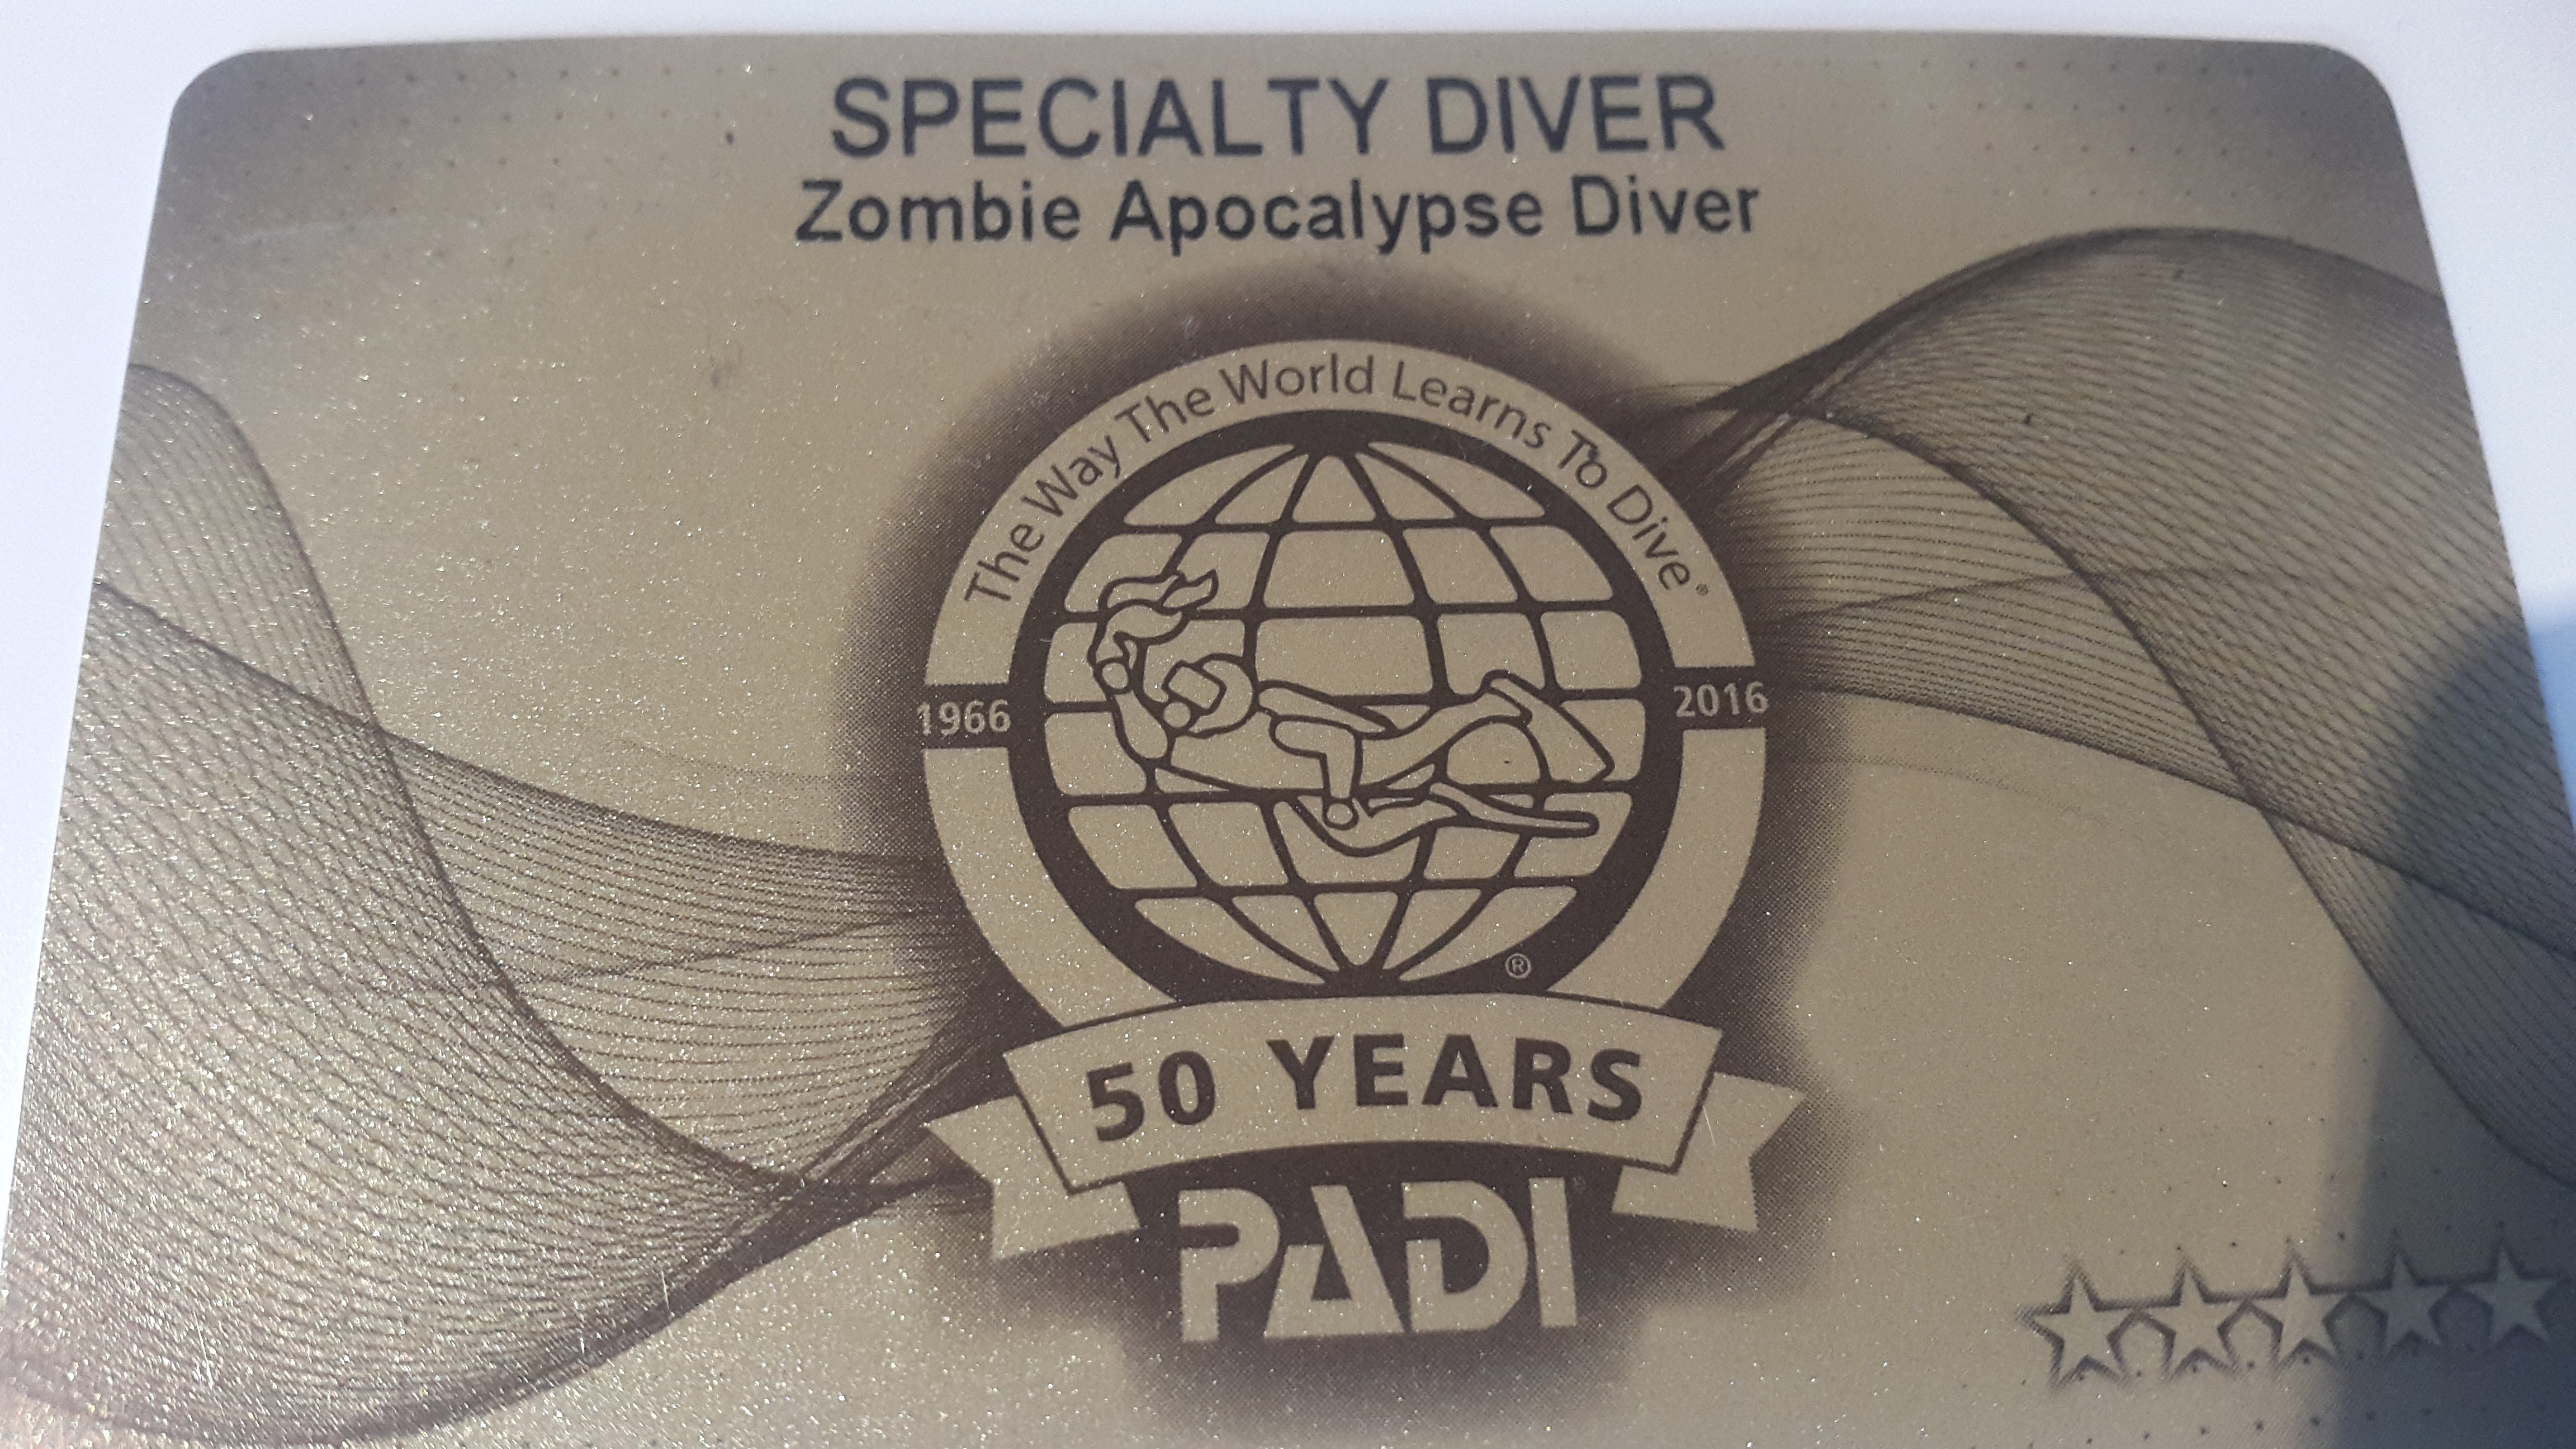 PADI Zombie Apocalypse Diver med Dive Team